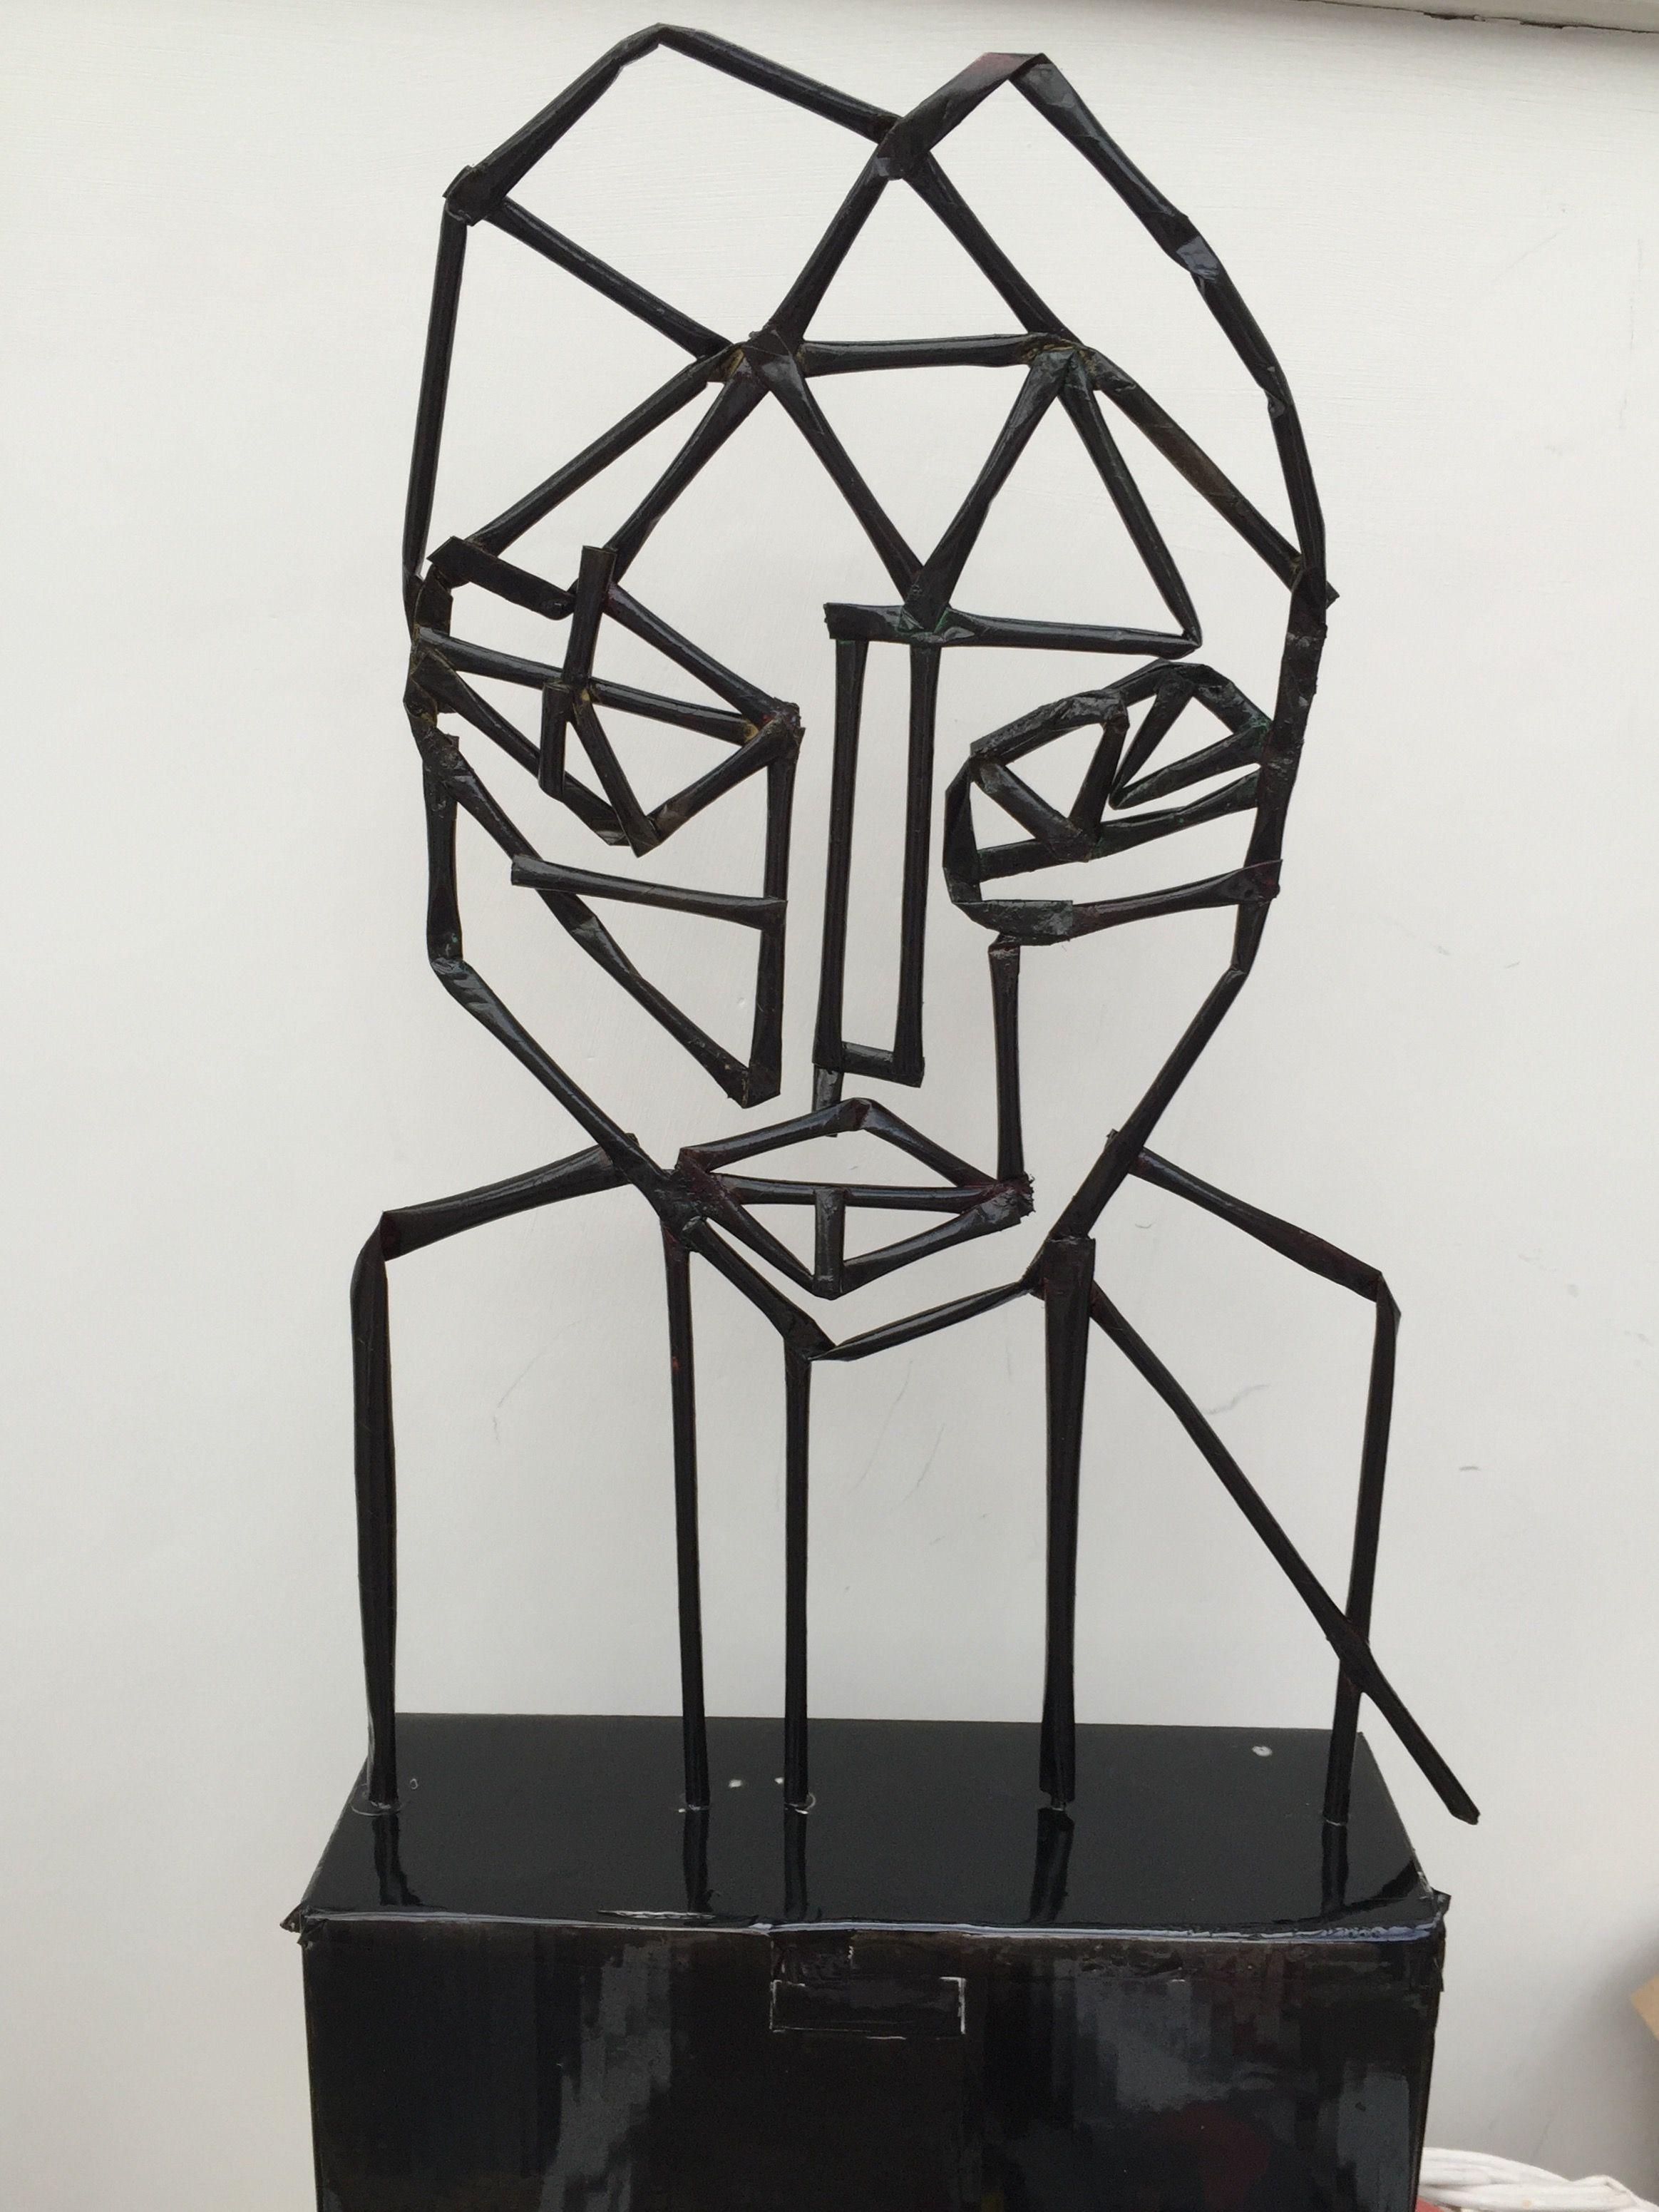 Naum Gabo Inspired 39 Head 39 Made From Drinking Straws